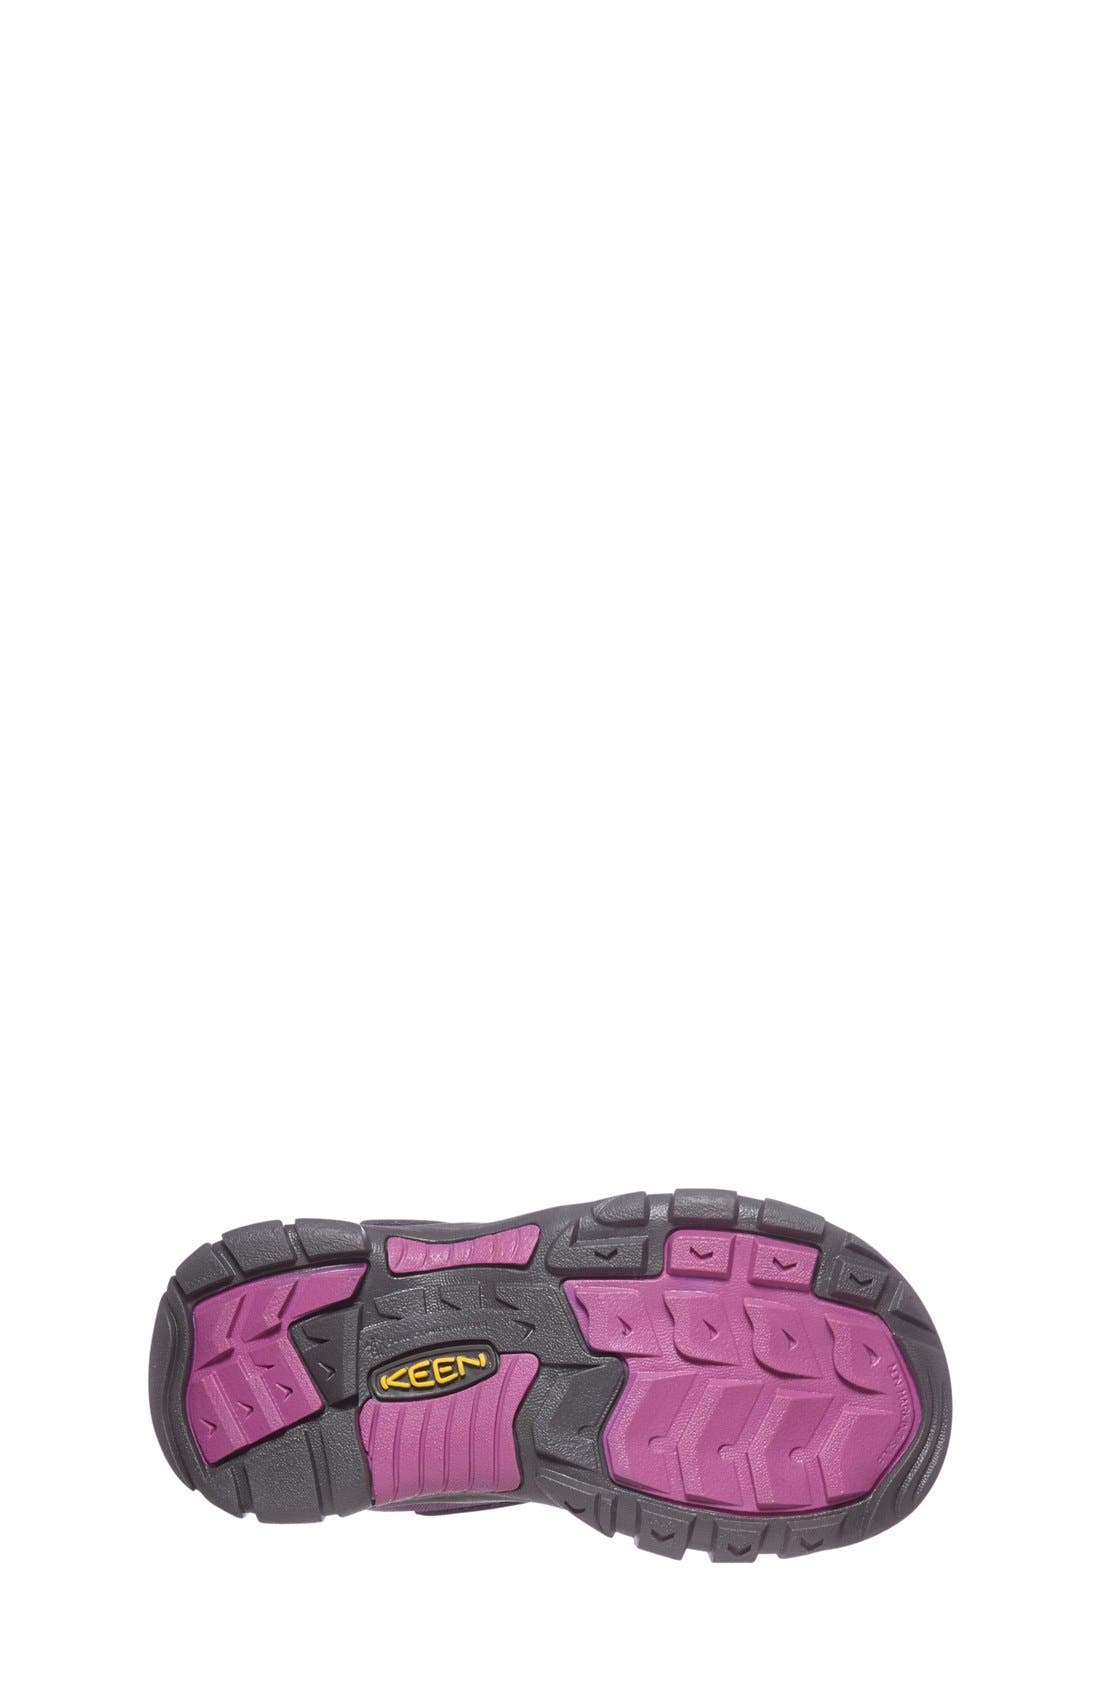 Alternate Image 4  - Keen 'Kootenay' Waterproof Winter Boot (Walker, Toddler, Little Kid & Big Kid)